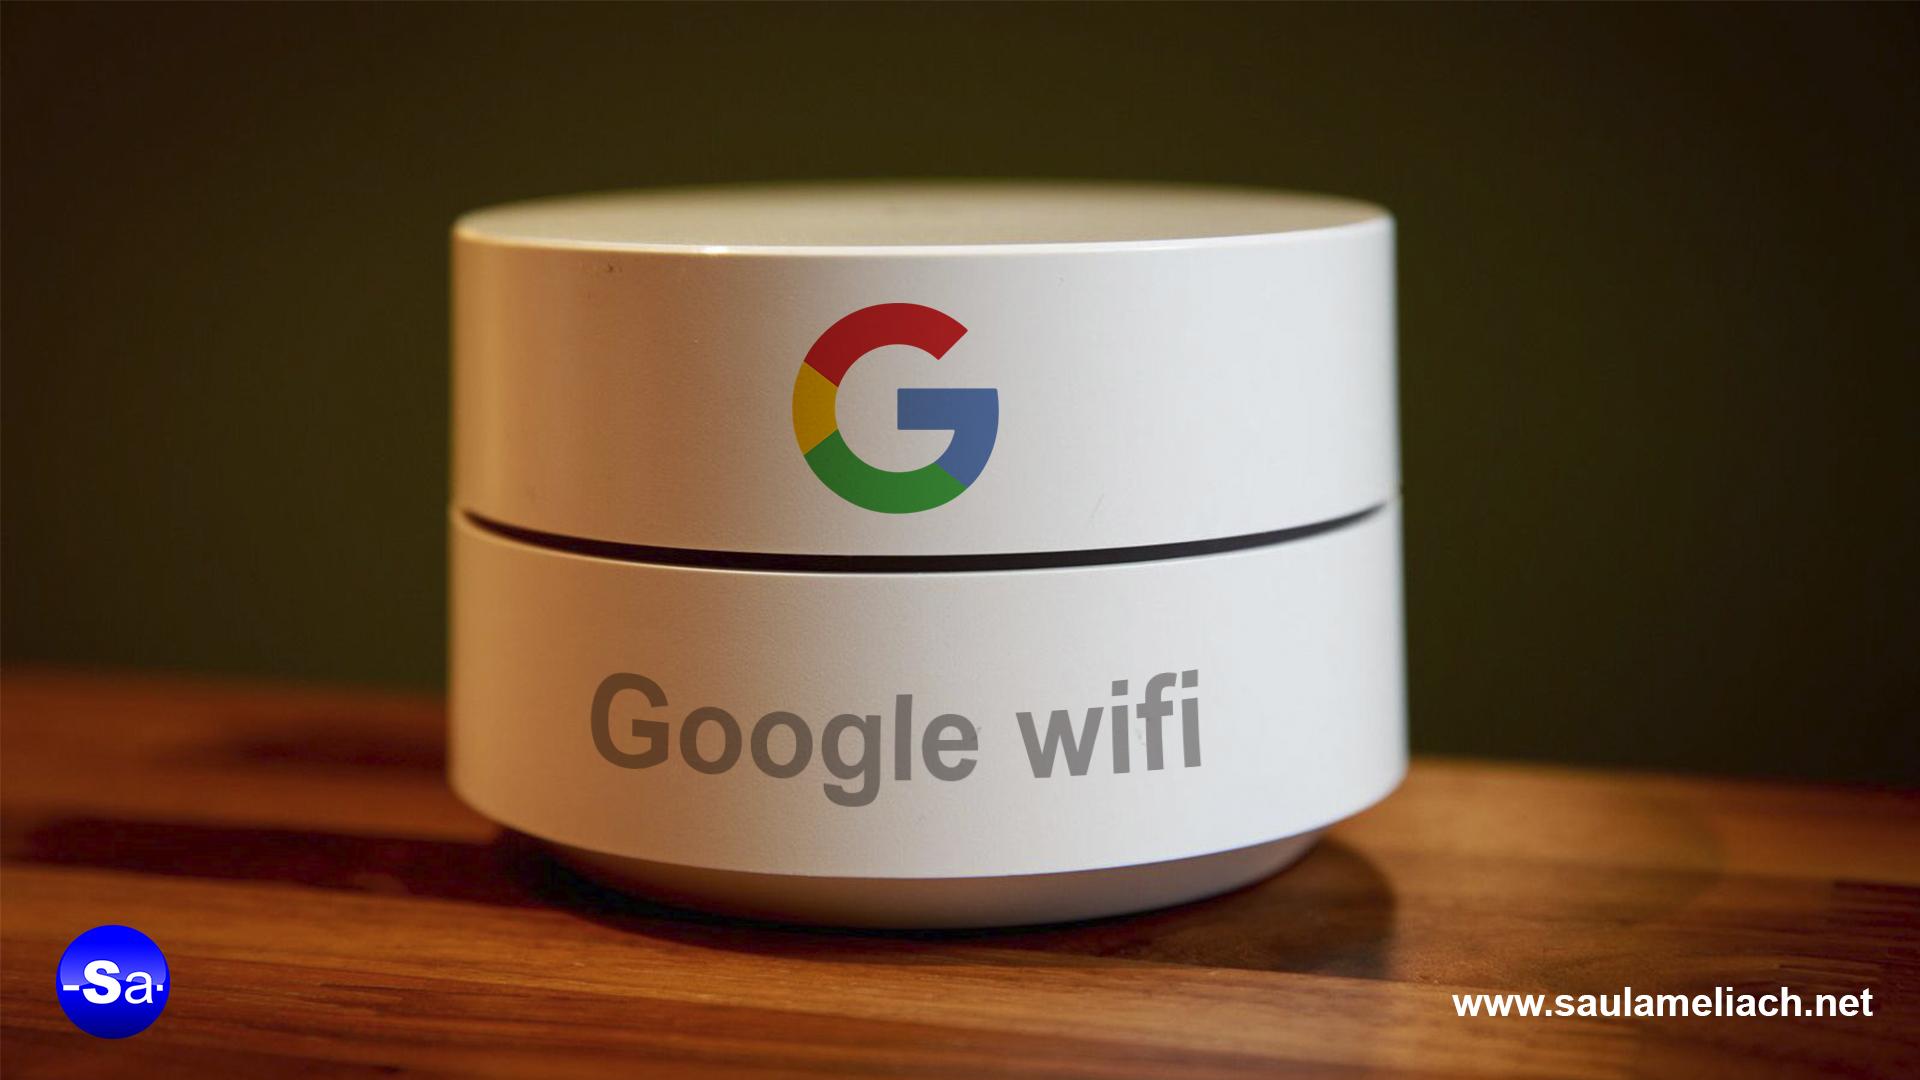 saul ameliach - router - wifi